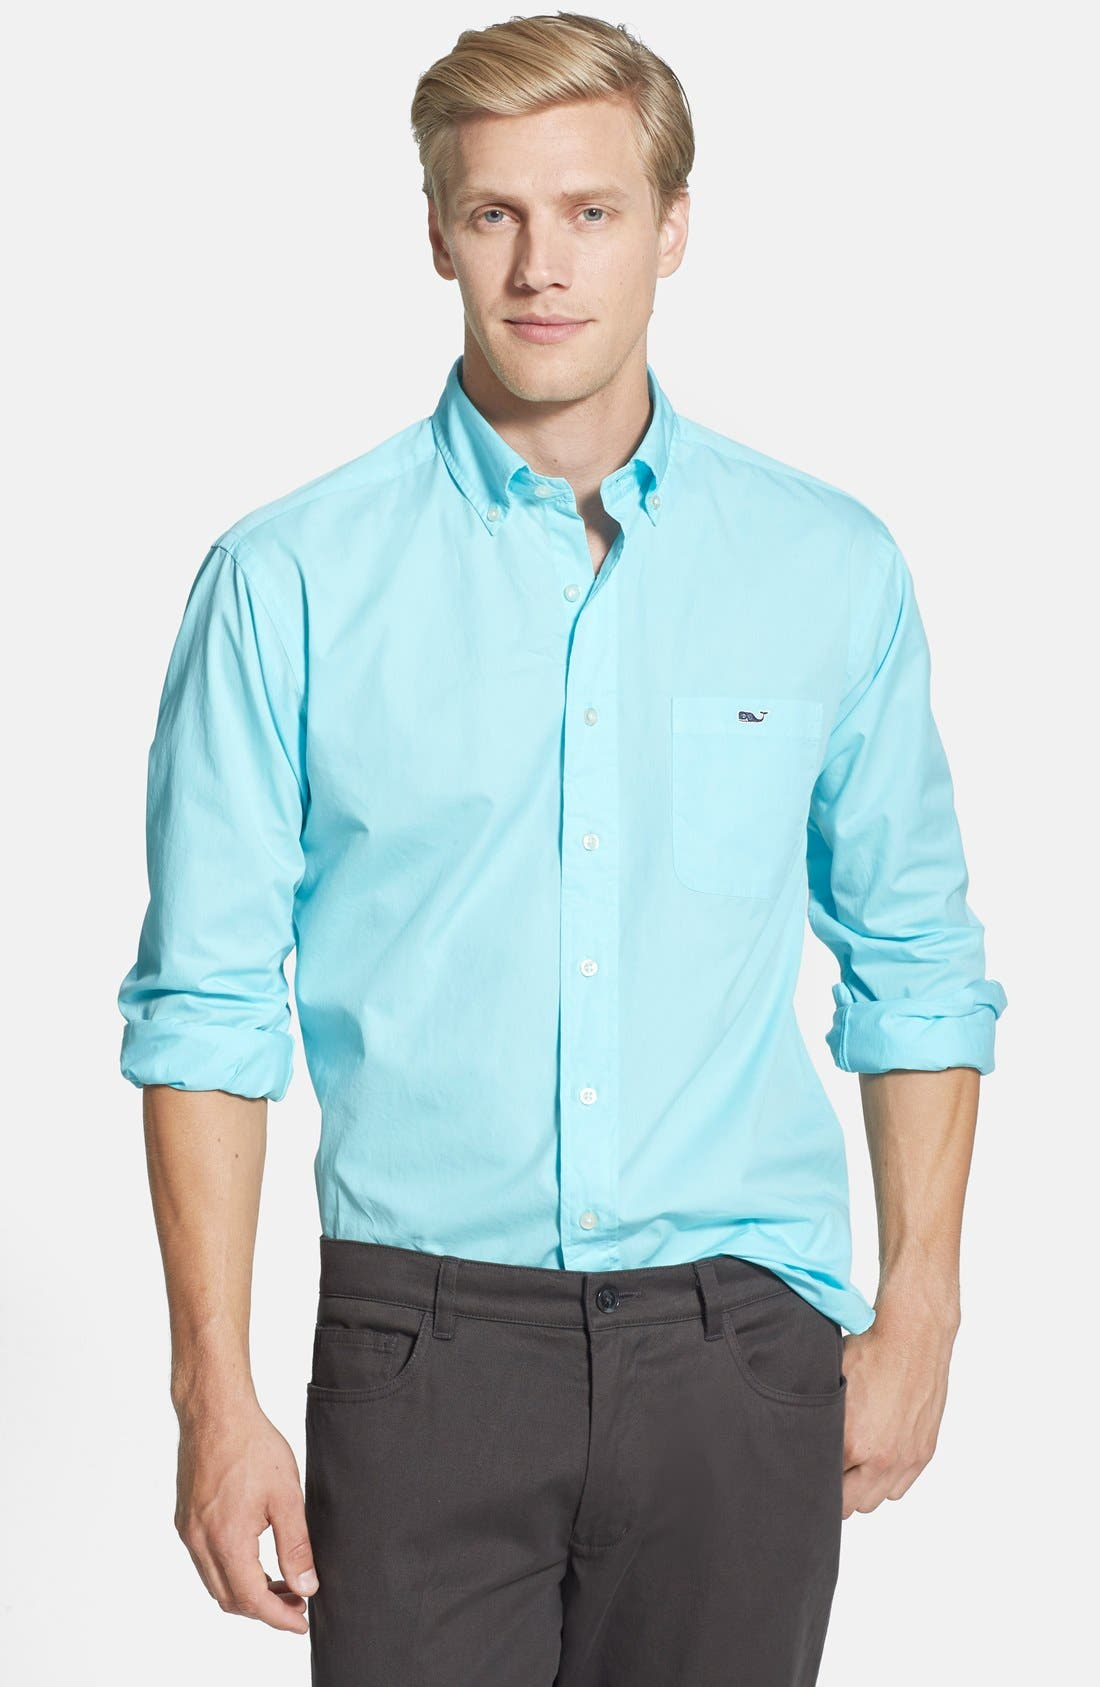 Alternate Image 1 Selected - Vineyard Vines 'Tucker - Harrington' Classic Fit Sport Shirt